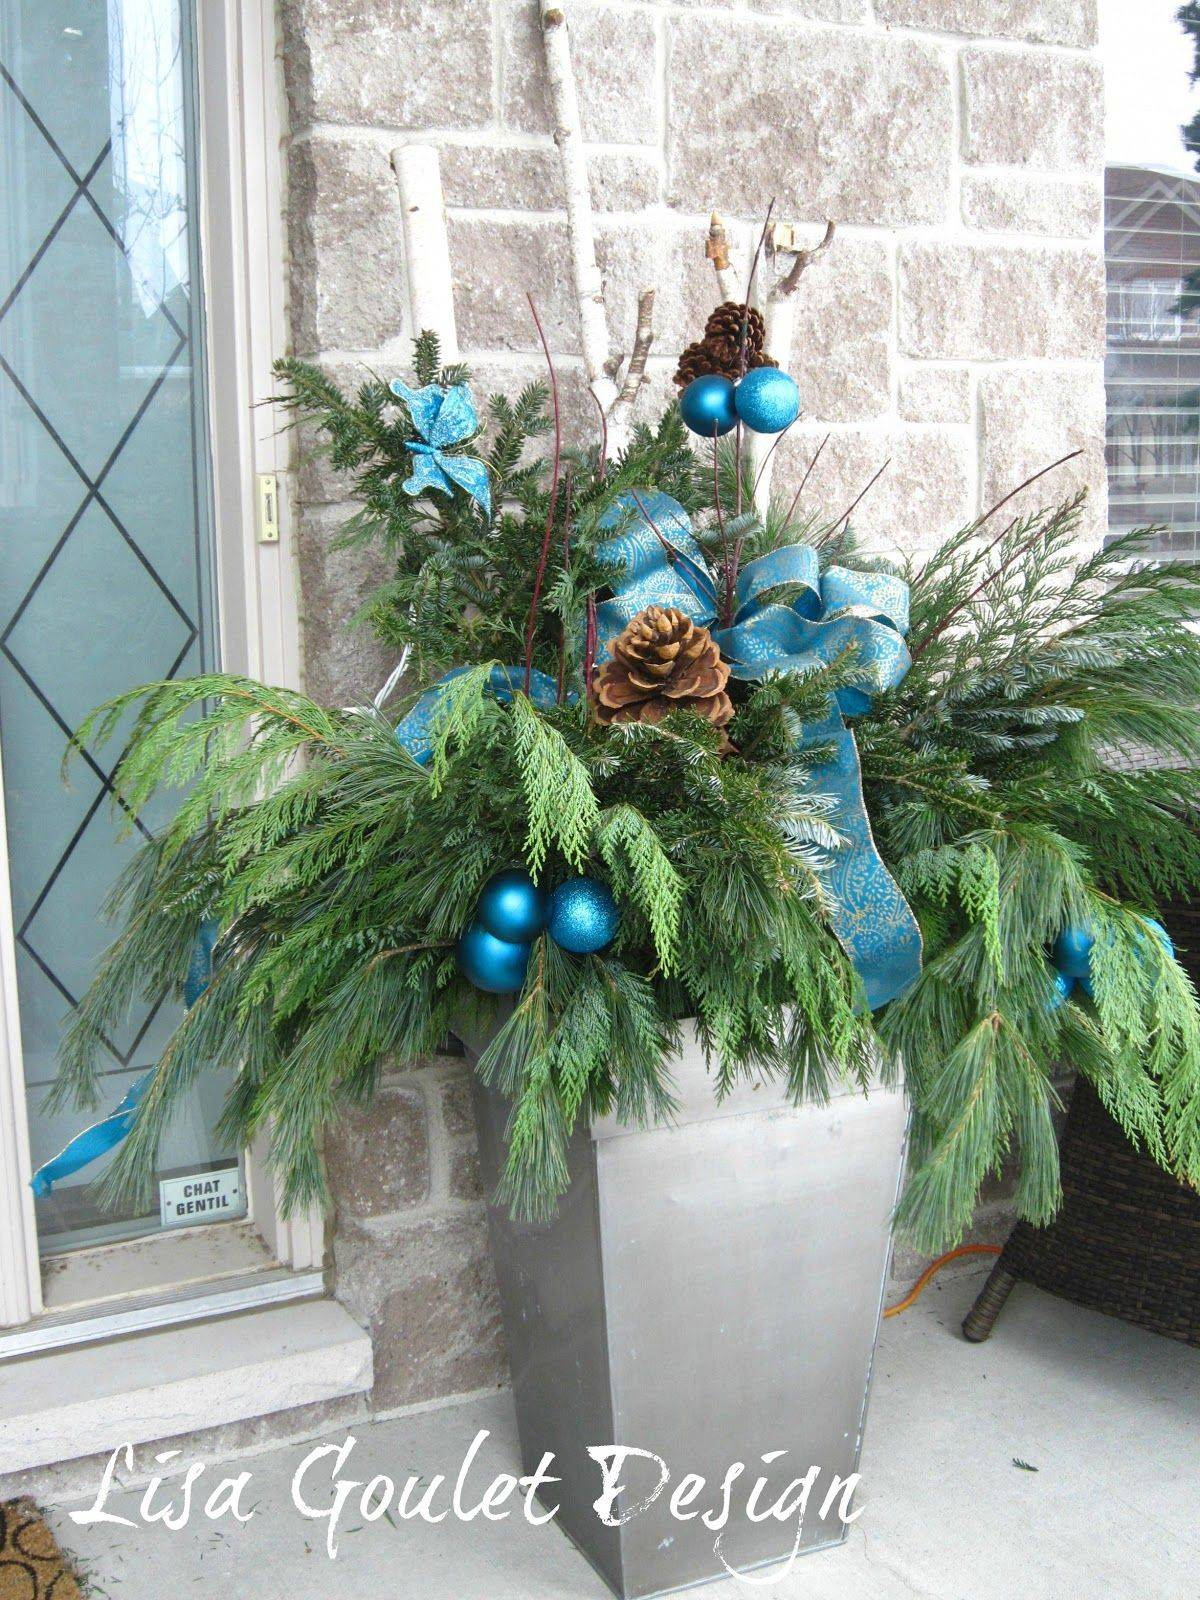 Aqua Blue Christmas Decorations Luxury Nature Image with Images